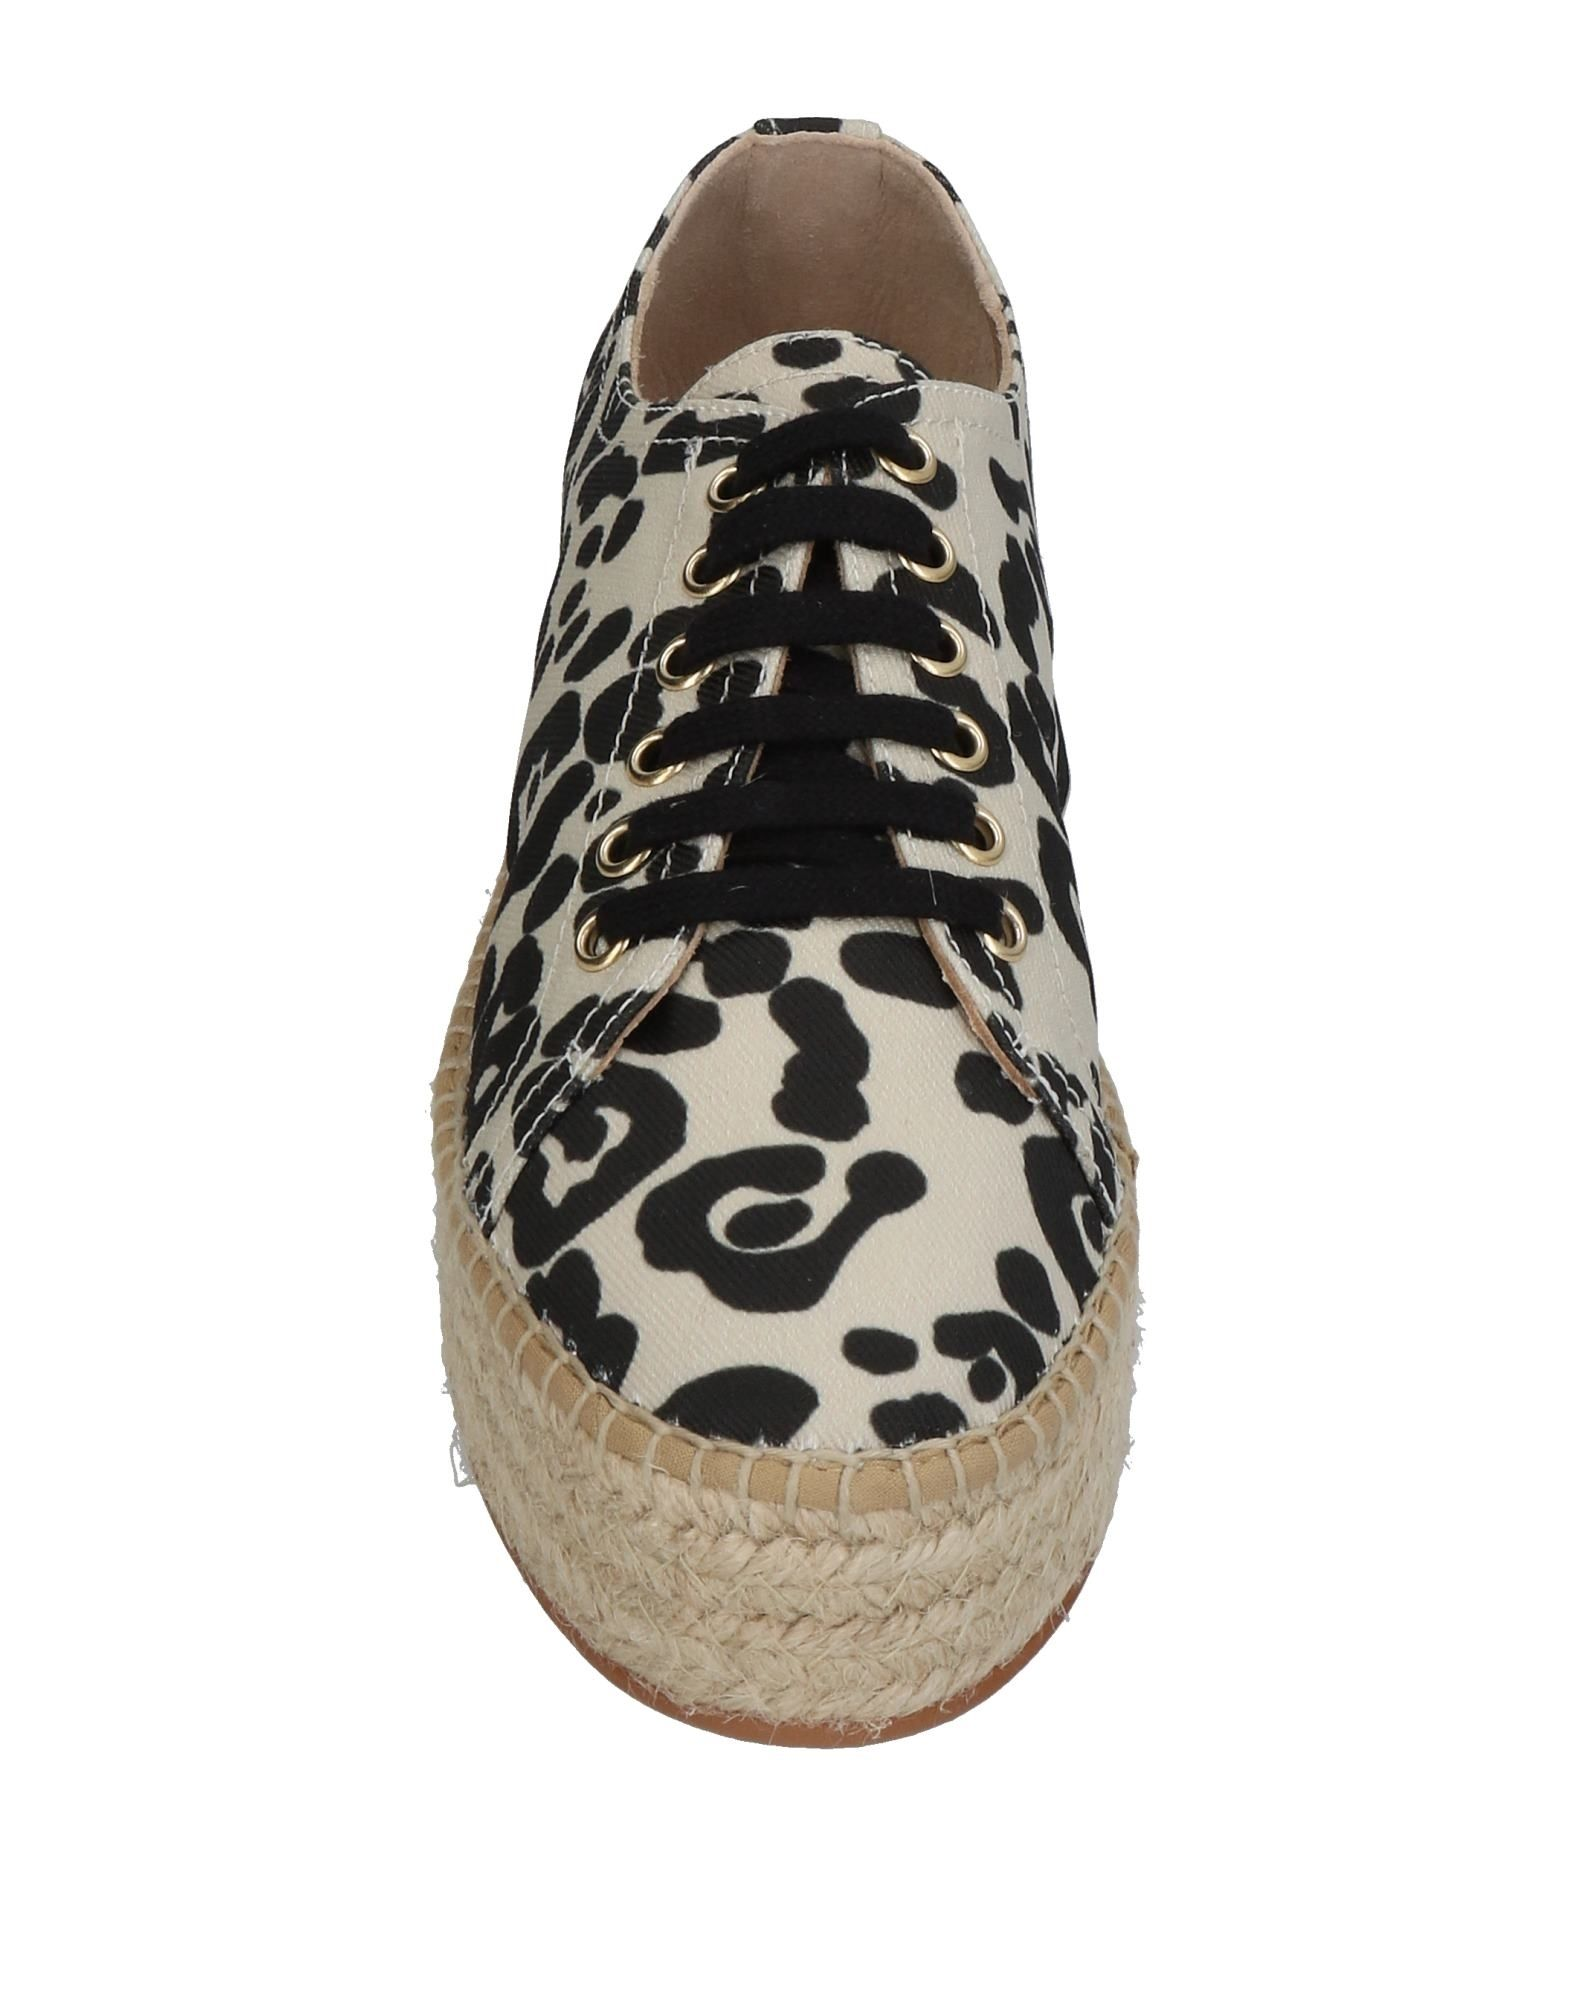 Pinko Sneakers Damen  11425694OL 11425694OL 11425694OL Gute Qualität beliebte Schuhe 678cfb